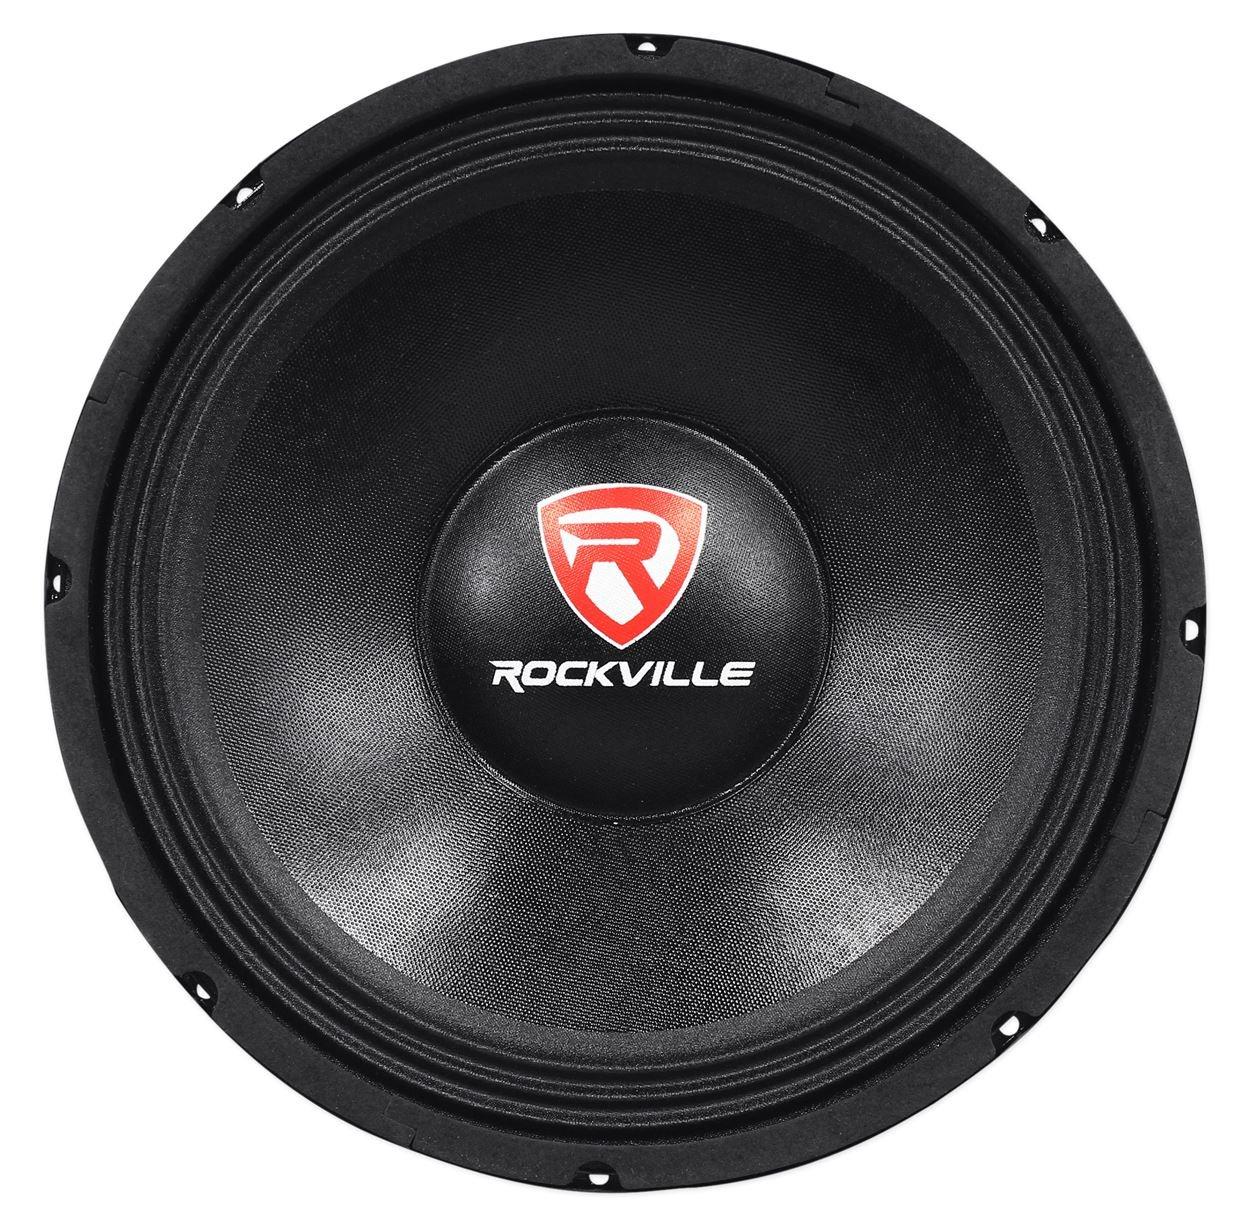 Rockville RVP12W4 600 Watt 12'' Raw Replacement DJ PA Subwoofer 4 Ohm Sub Woofer by Rockville